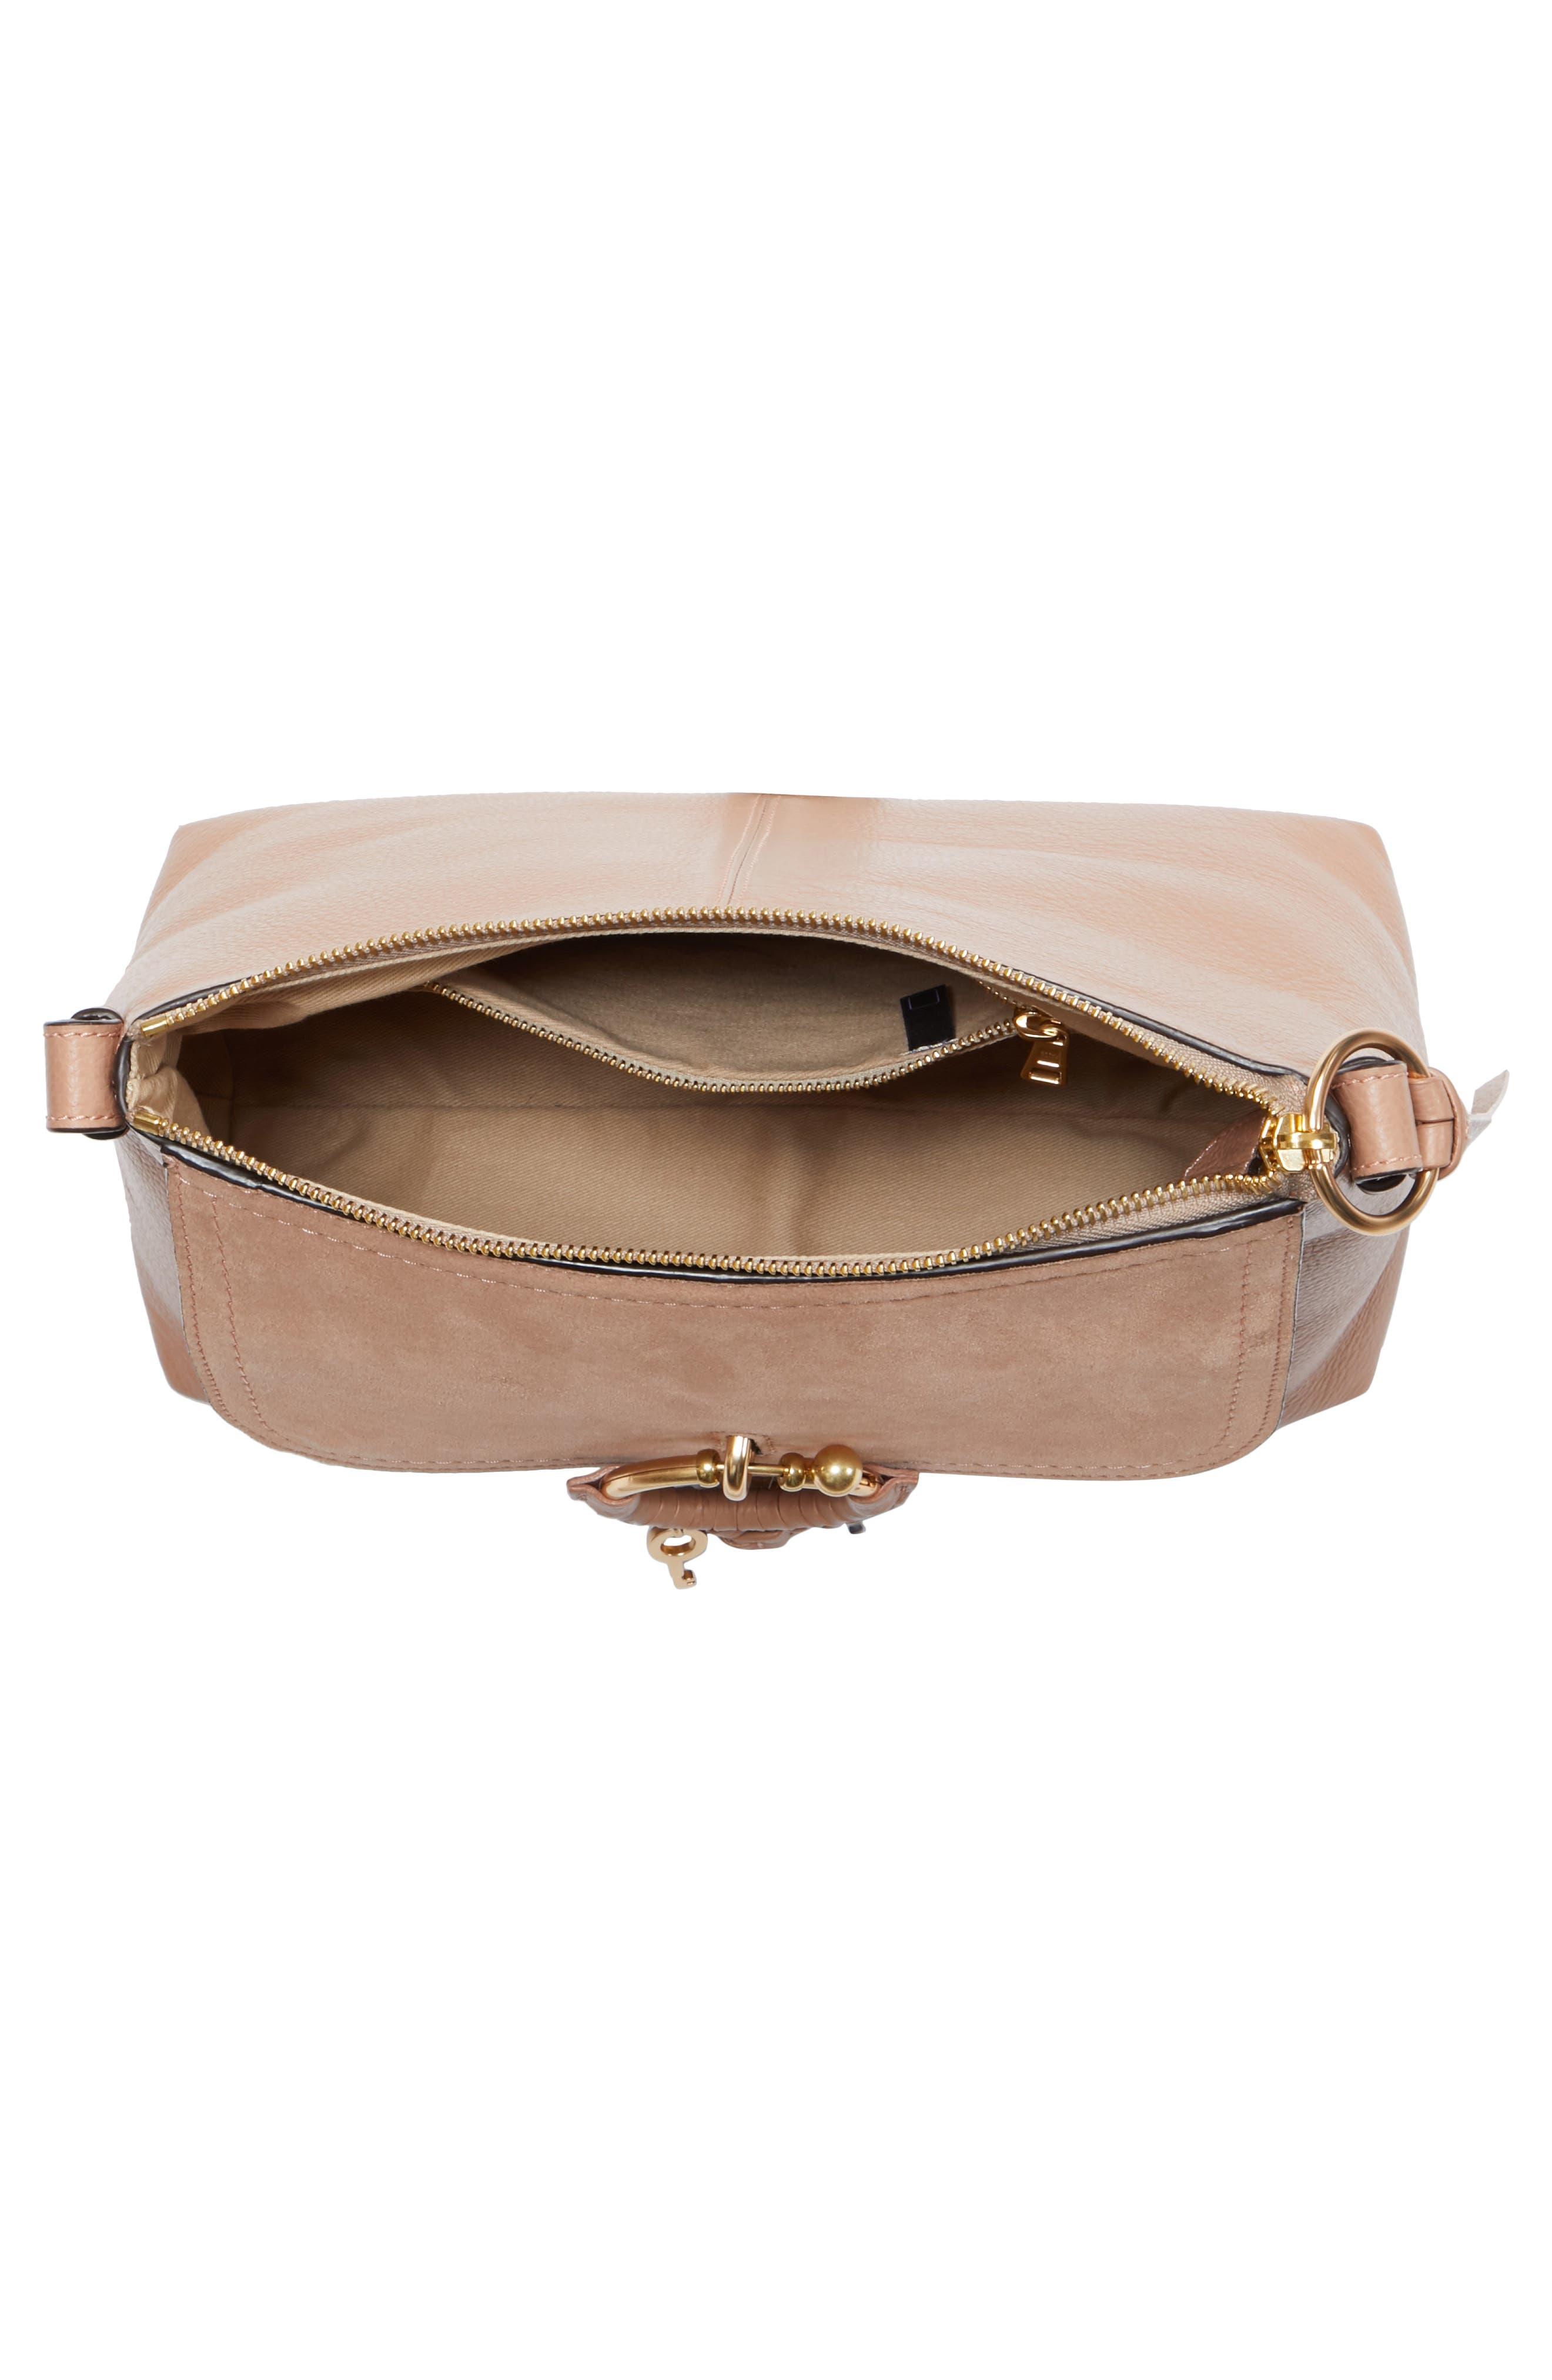 Small Joan Leather Shoulder Bag,                             Alternate thumbnail 4, color,                             650